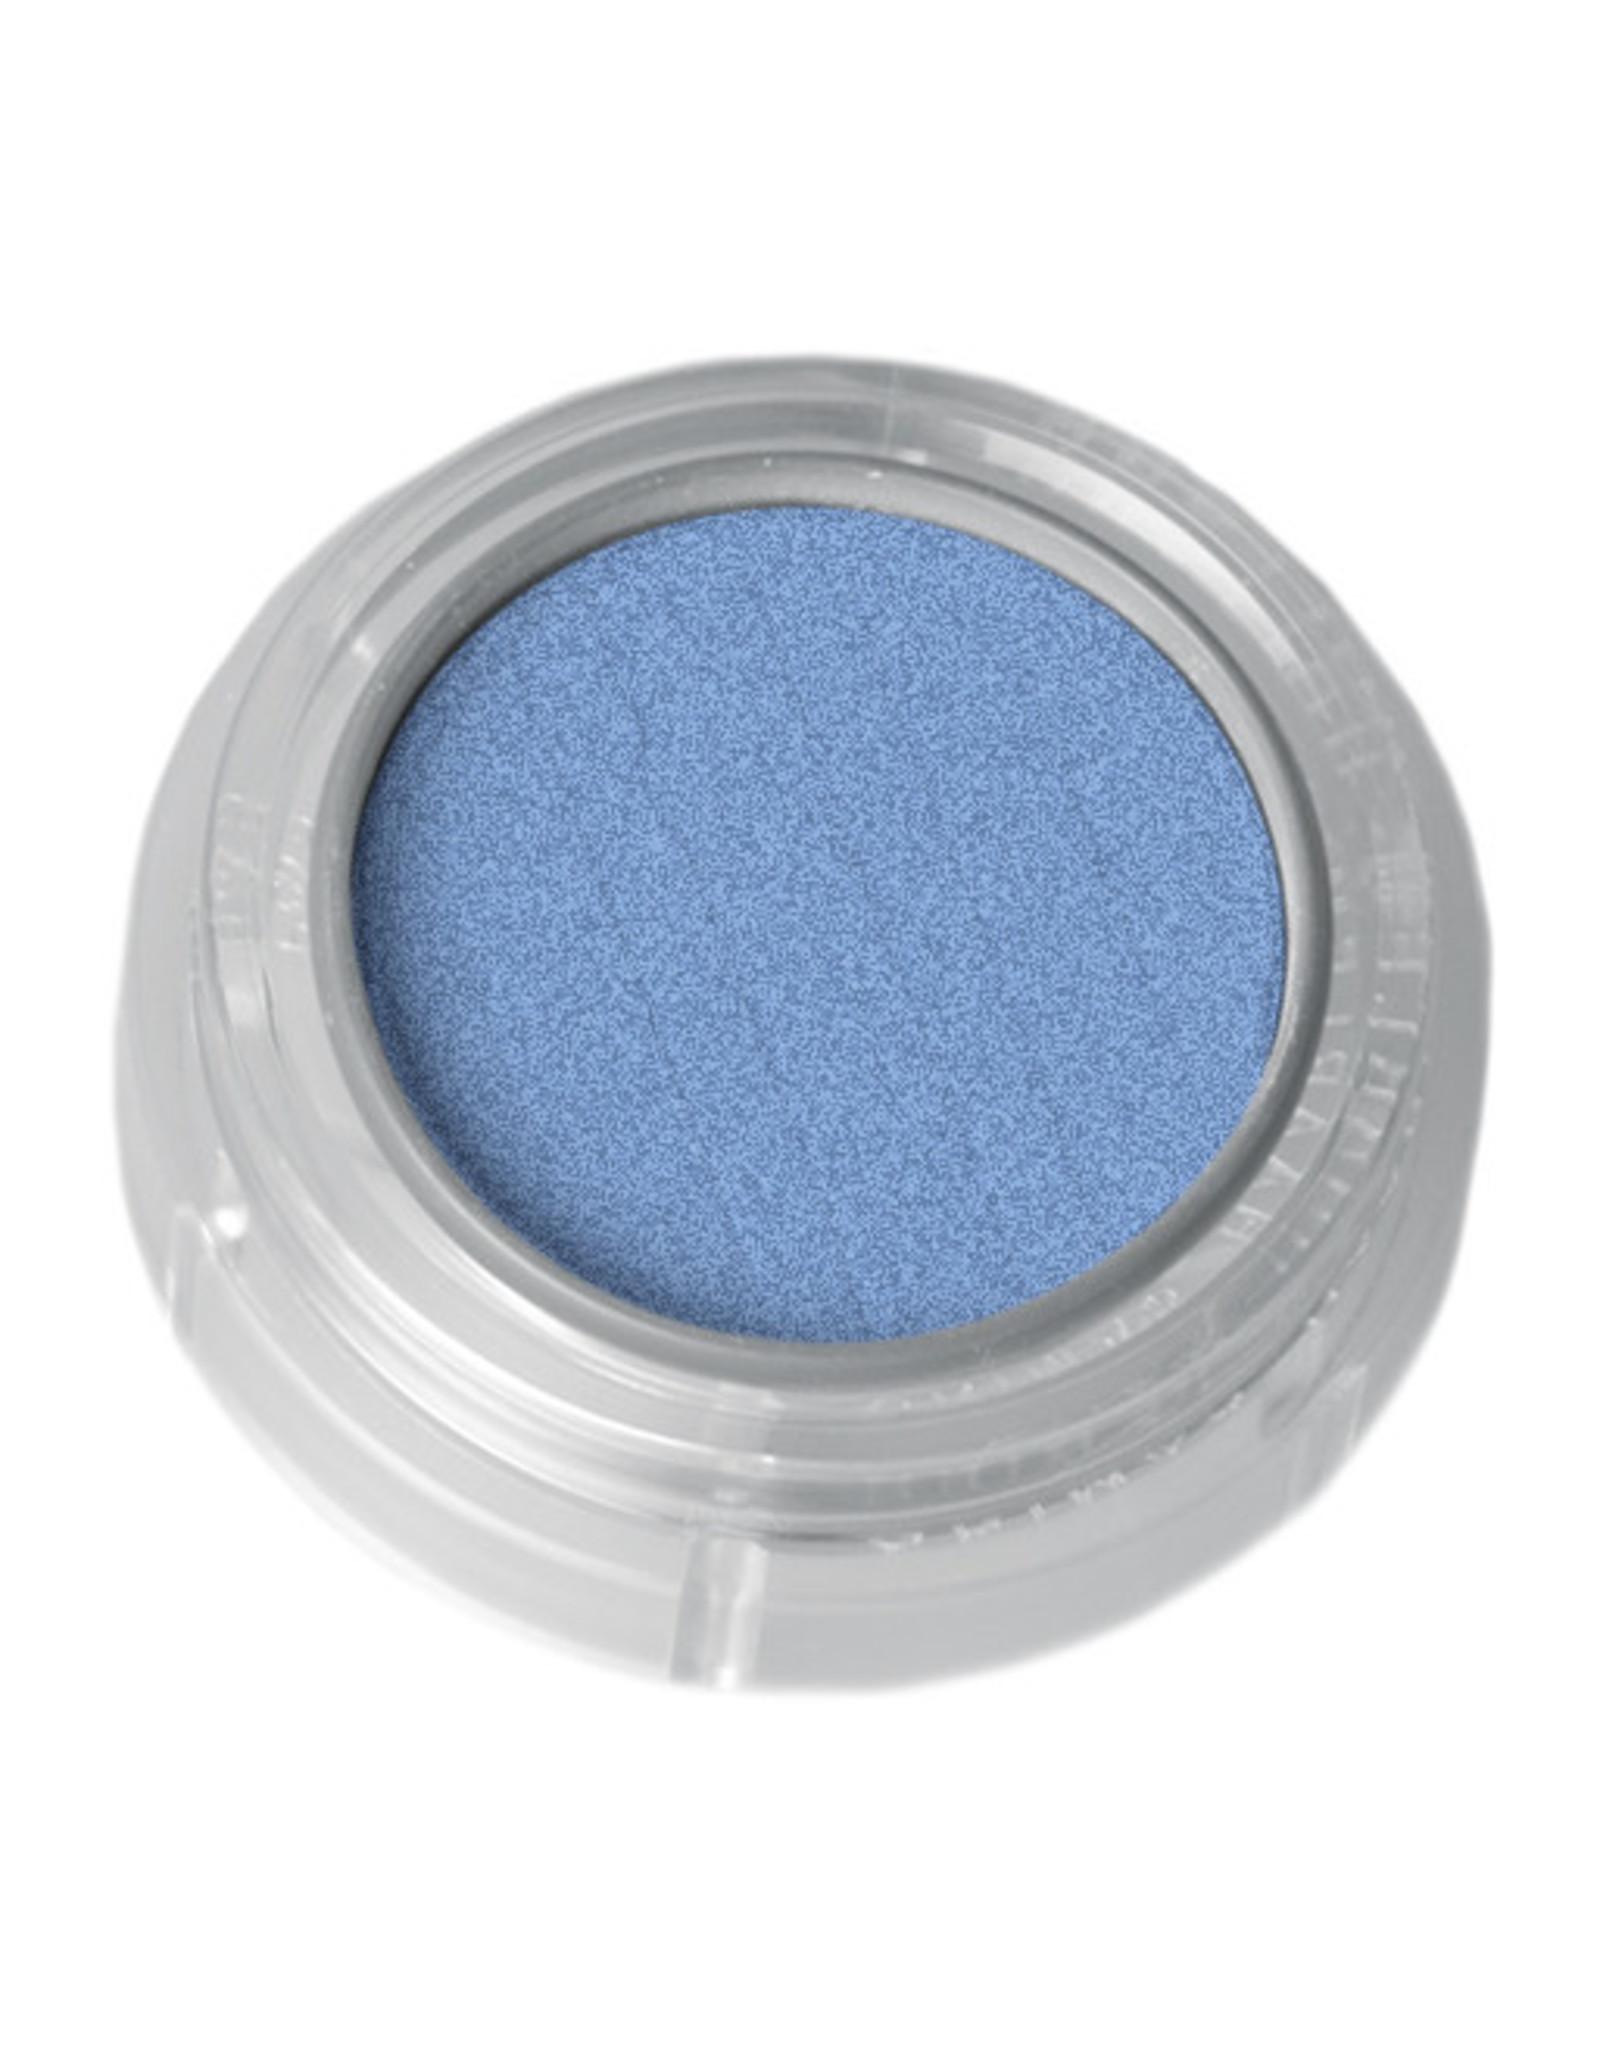 Grimas EYESHADOW/ROUGE PEARL 730 Pearl Blauw A1 (2,5 g)